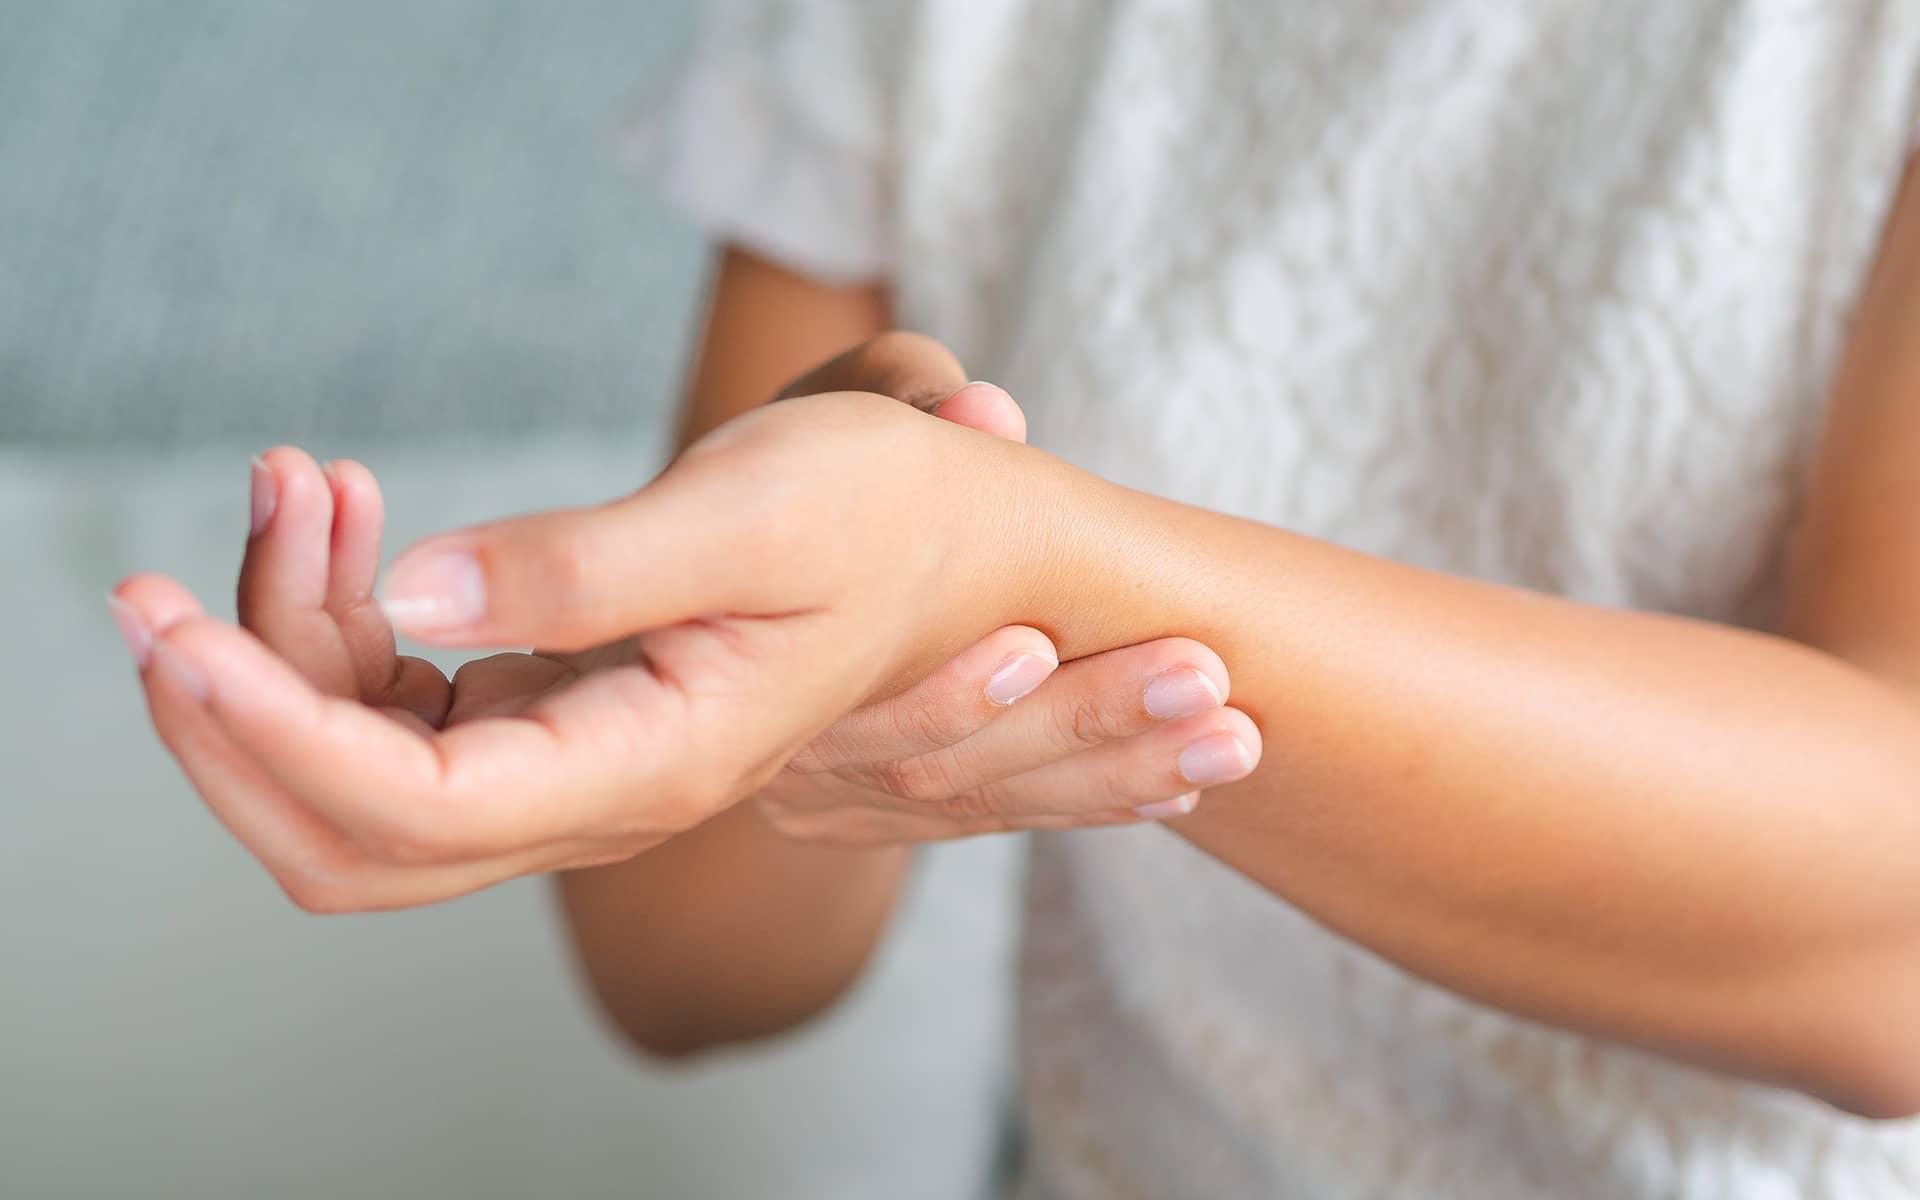 Exercices mains et poignets